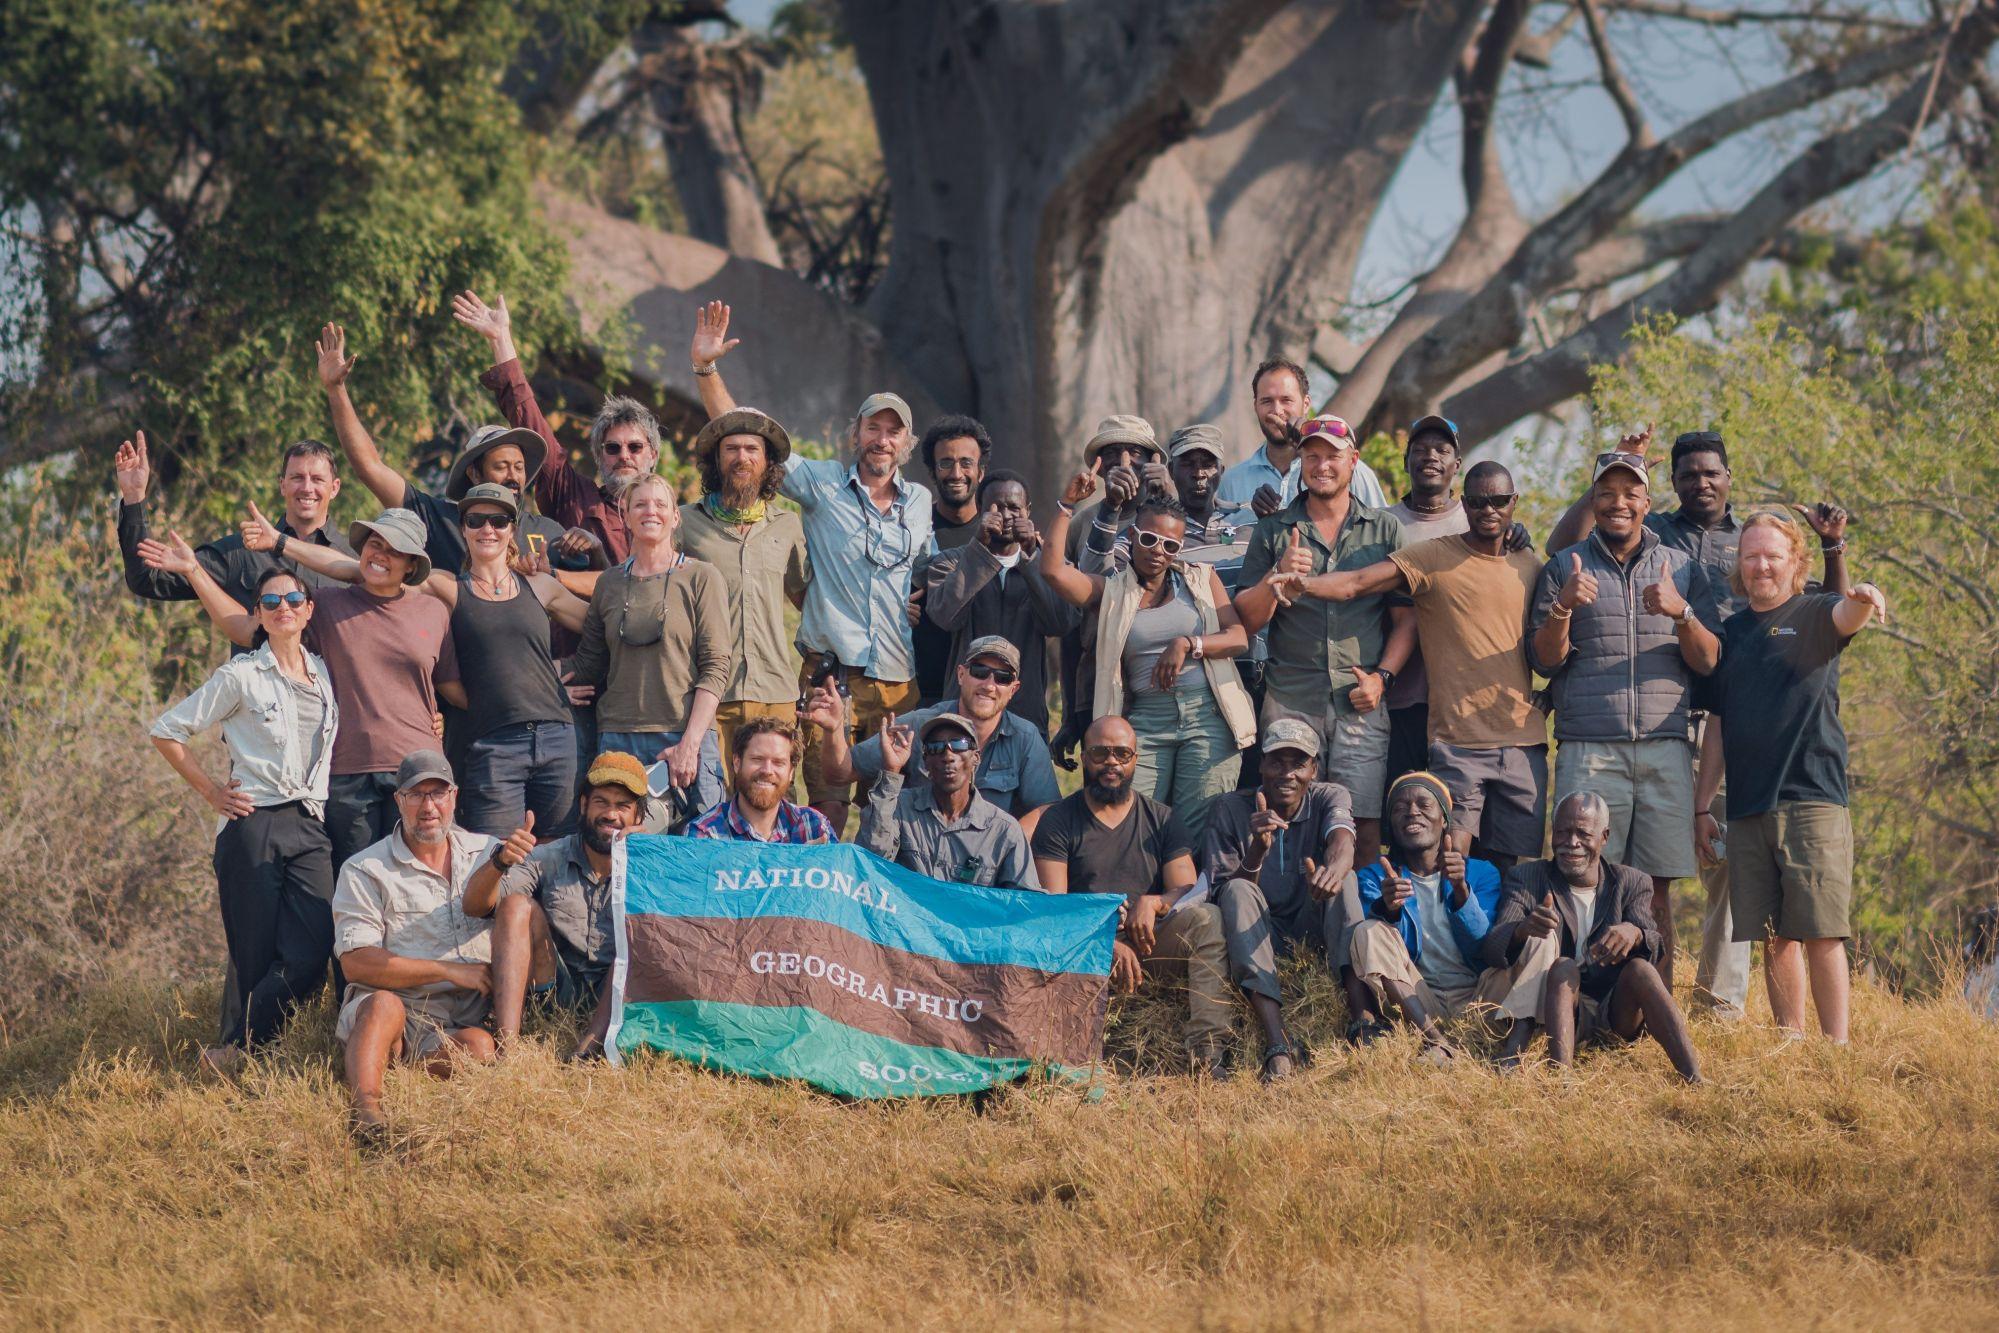 Okavango Wilderness Team Announced As Winner Of Rolex National Geographic Explorer of the Year 2019